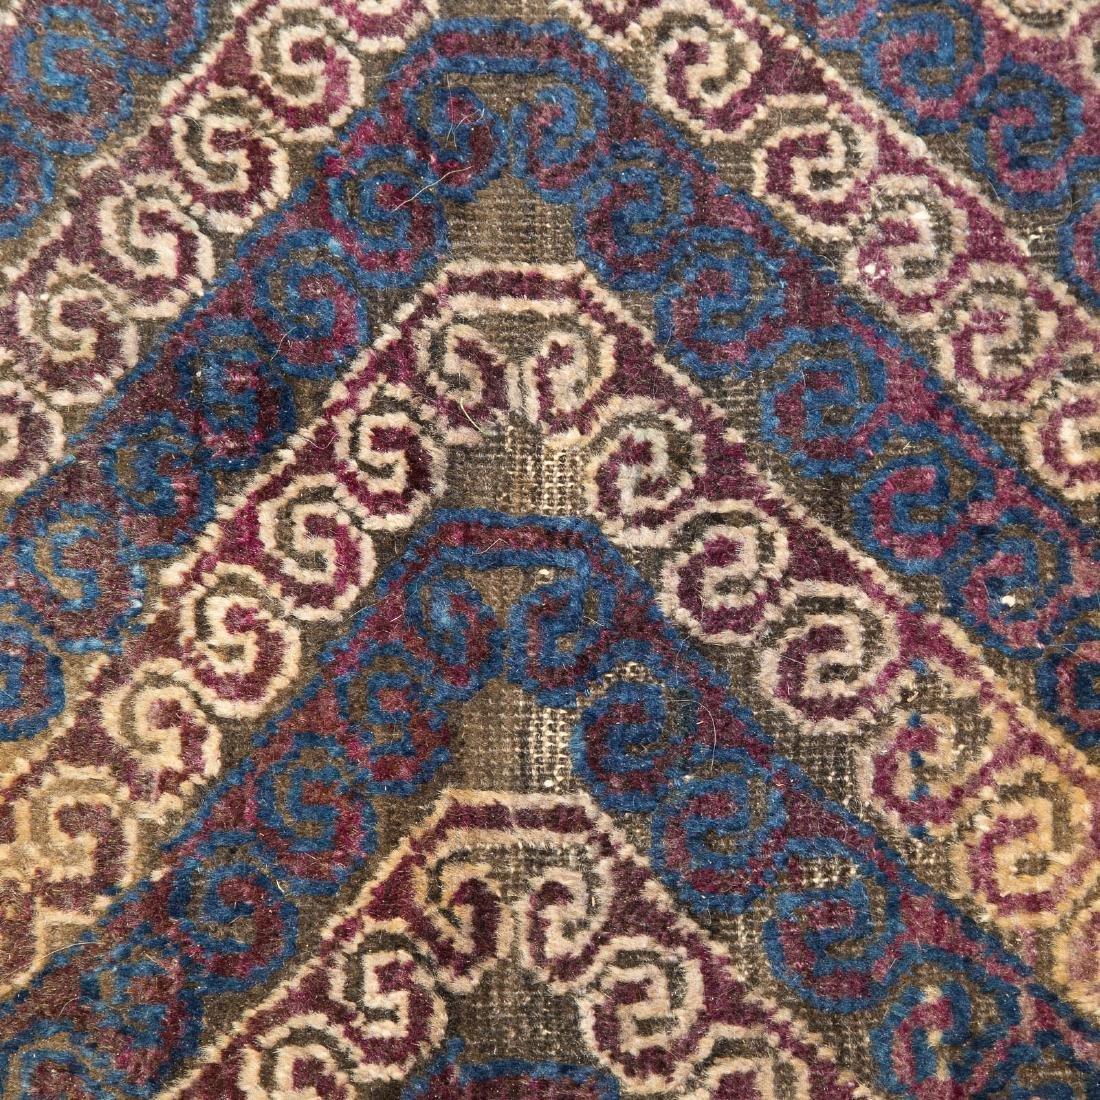 Antique Belouch rug, approx. 5.10 x 9.1 - 4